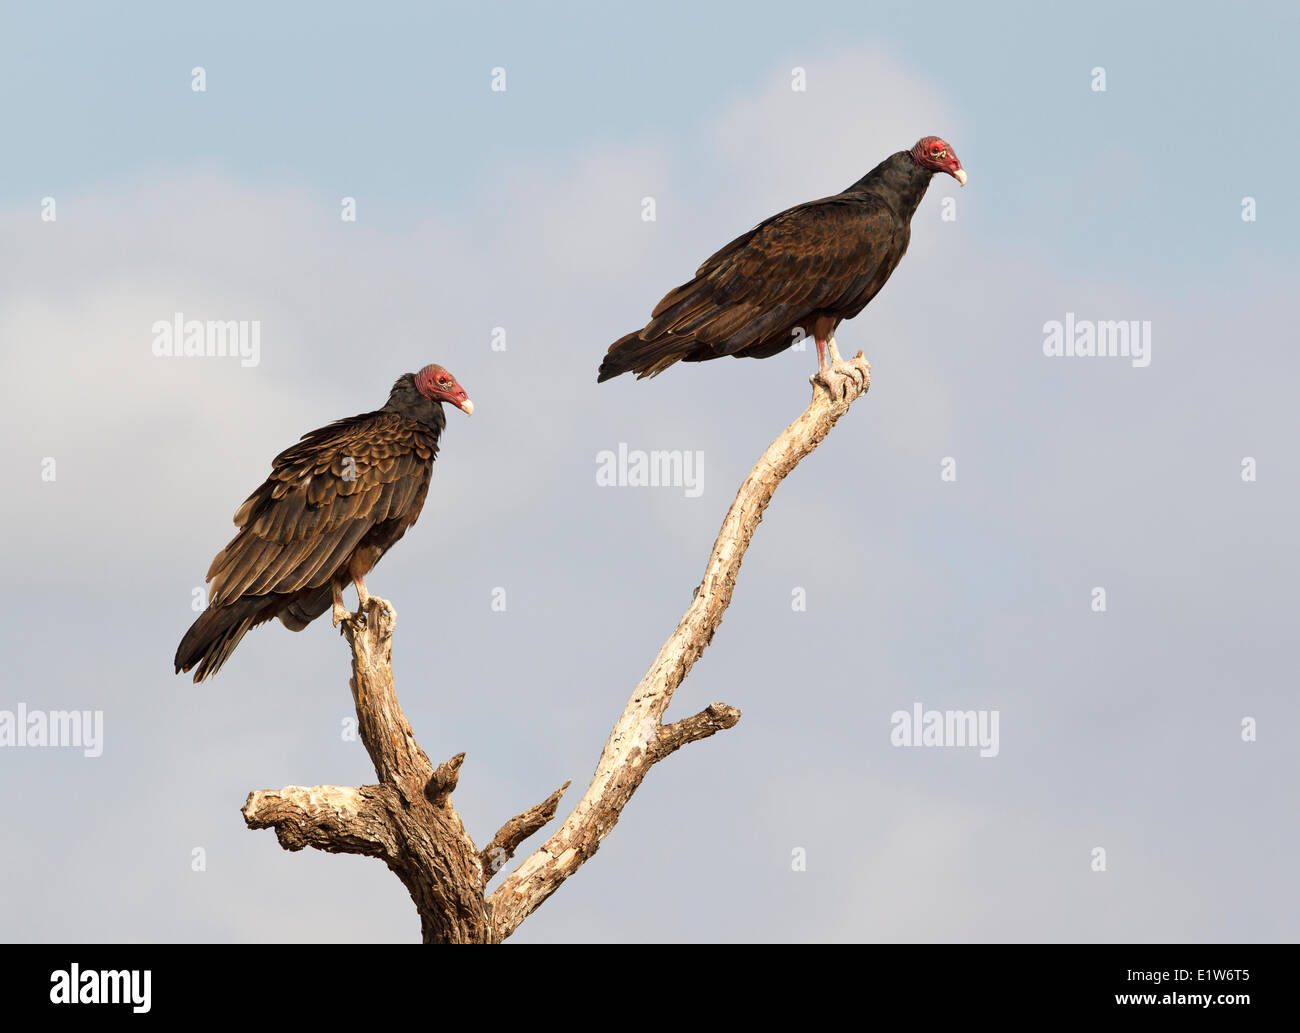 Tturkey vultures (Cathartes aura),  Martin Refuge, near Edinburg, South Texas. - Stock Image